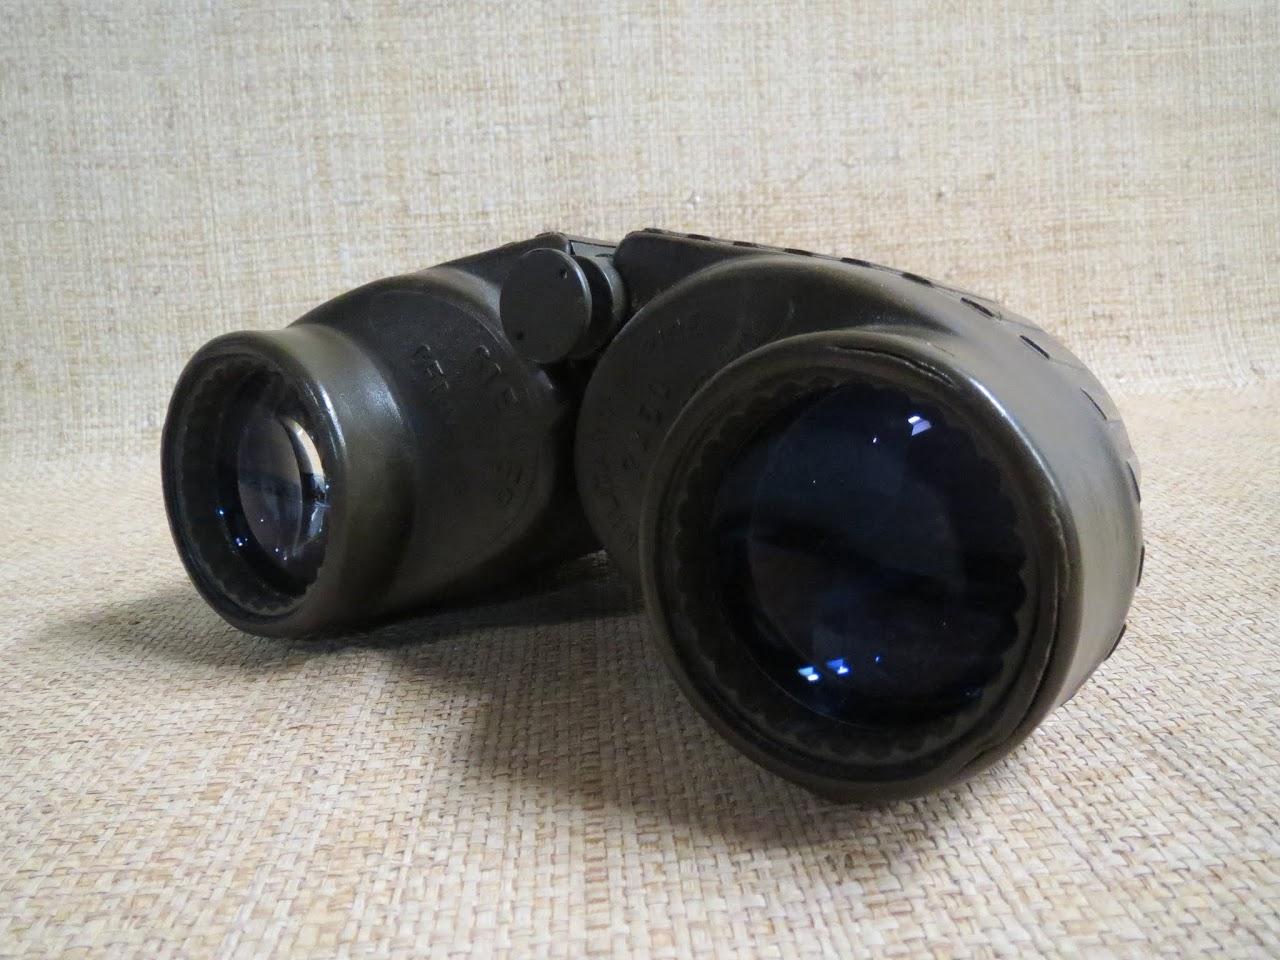 Vintage Steiner 7x50 Military Binoculars